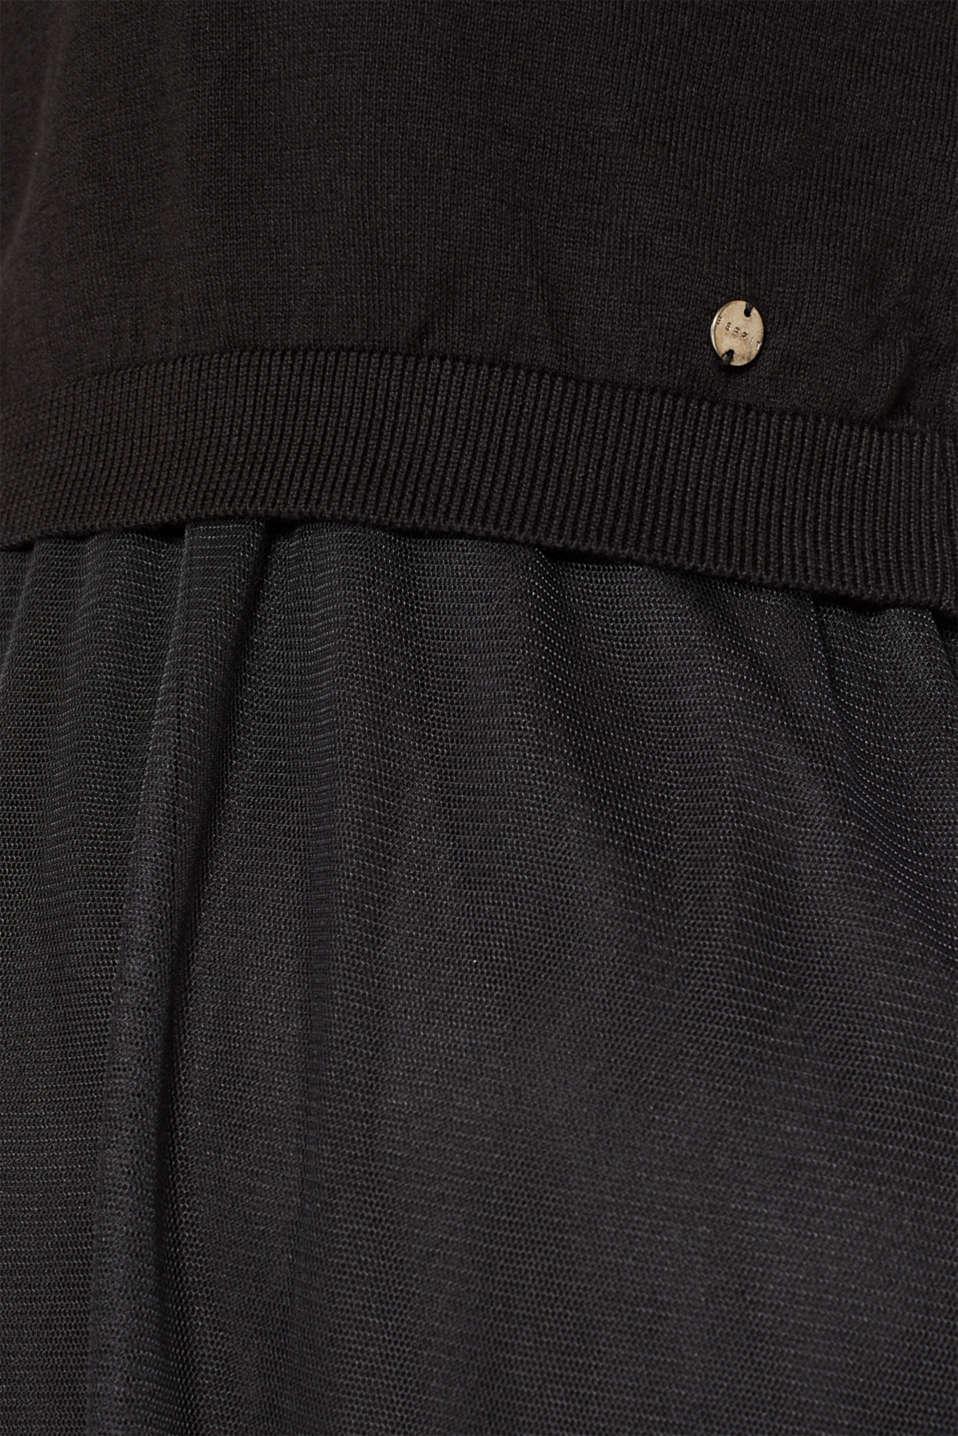 Mixed material nursing dress, LCBLACK, detail image number 4